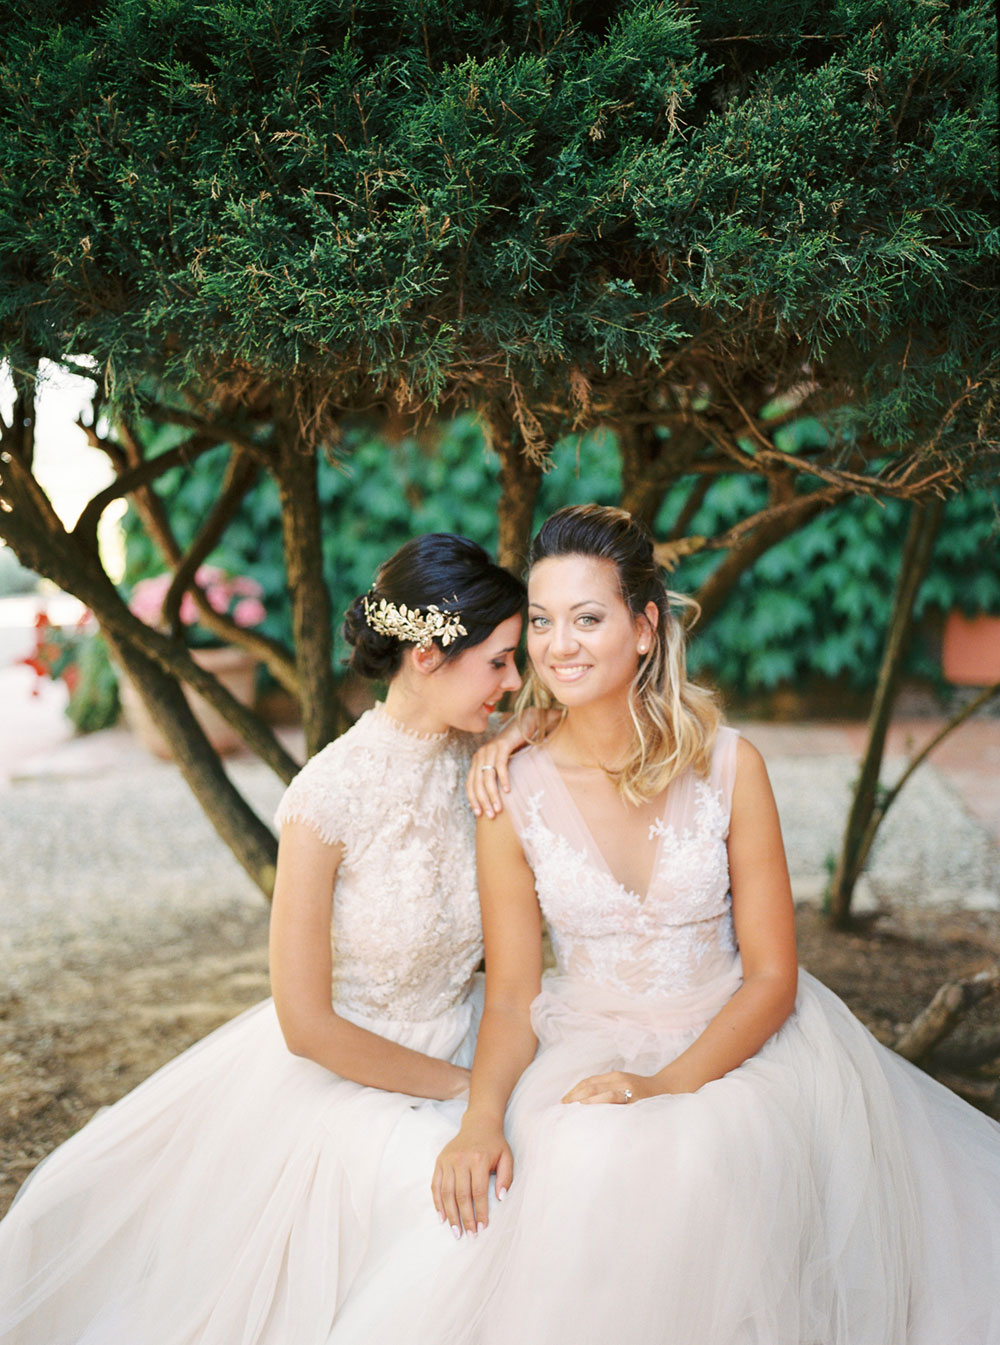 Linari-Tuscany-Elopement-Courtney-Michaela-219